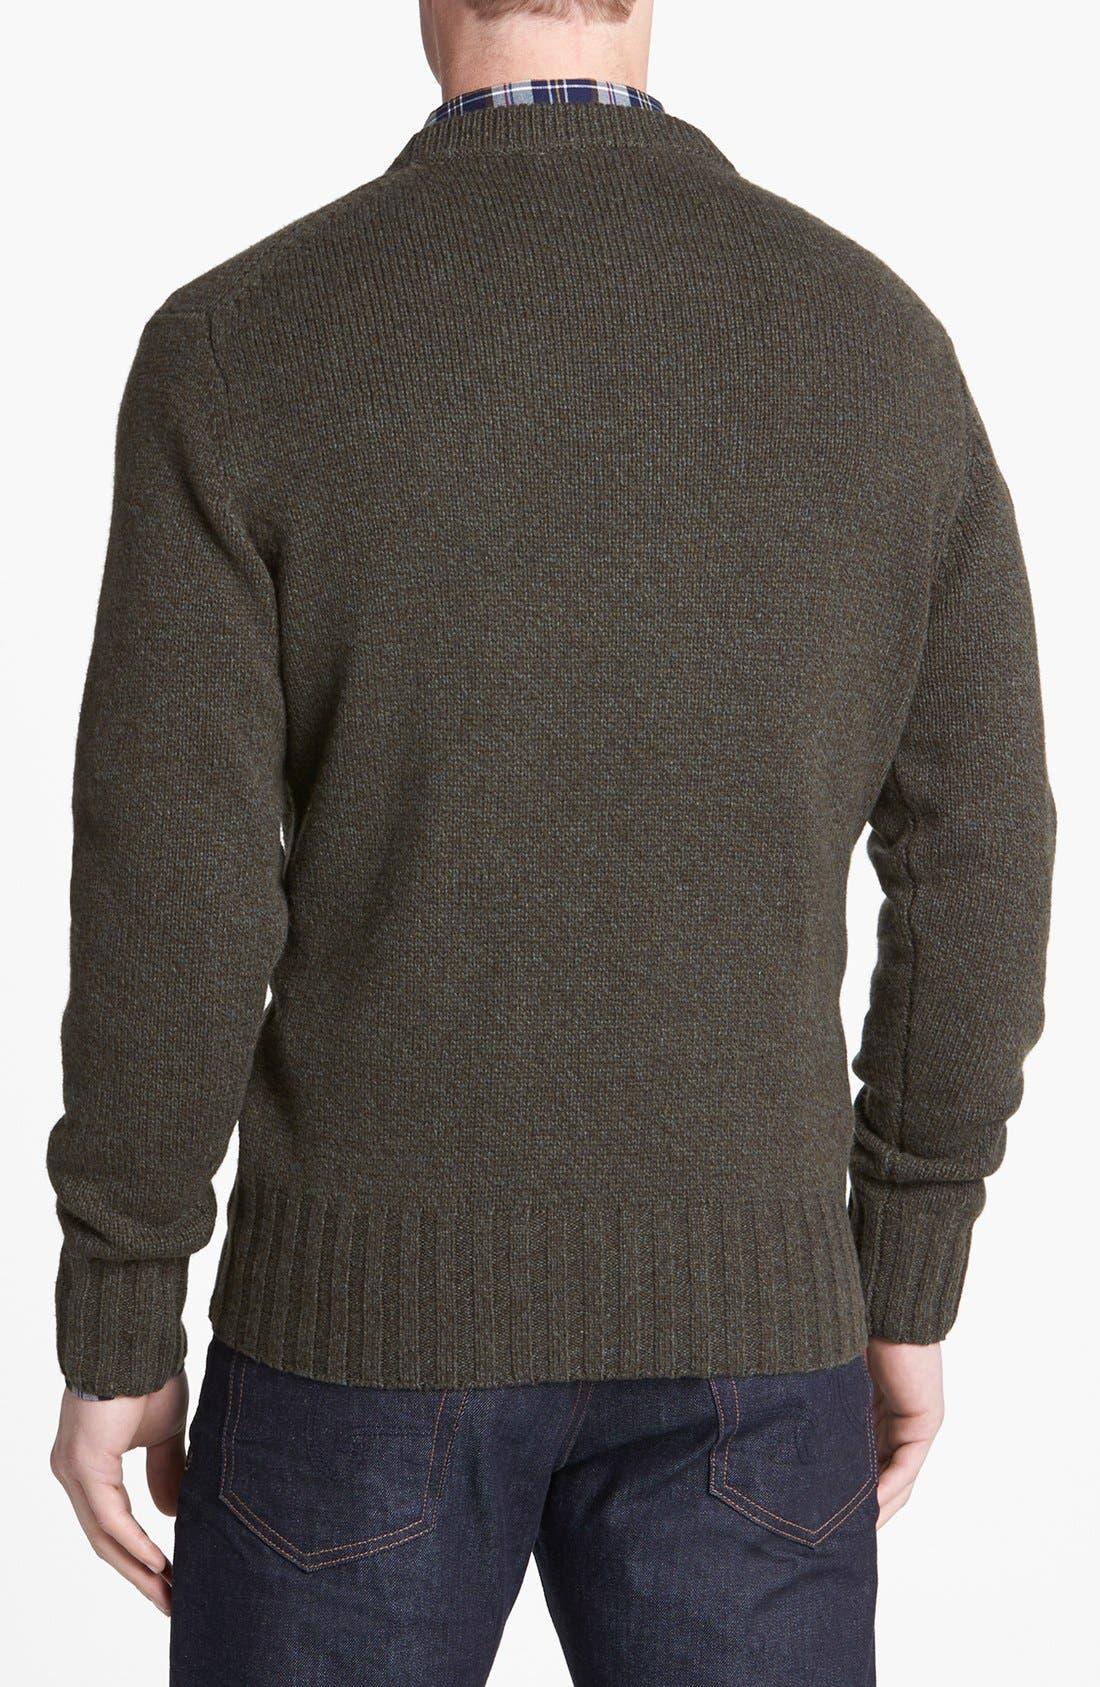 Alternate Image 2  - Rodd & Gunn 'Sumer' Cable Knit Sweater